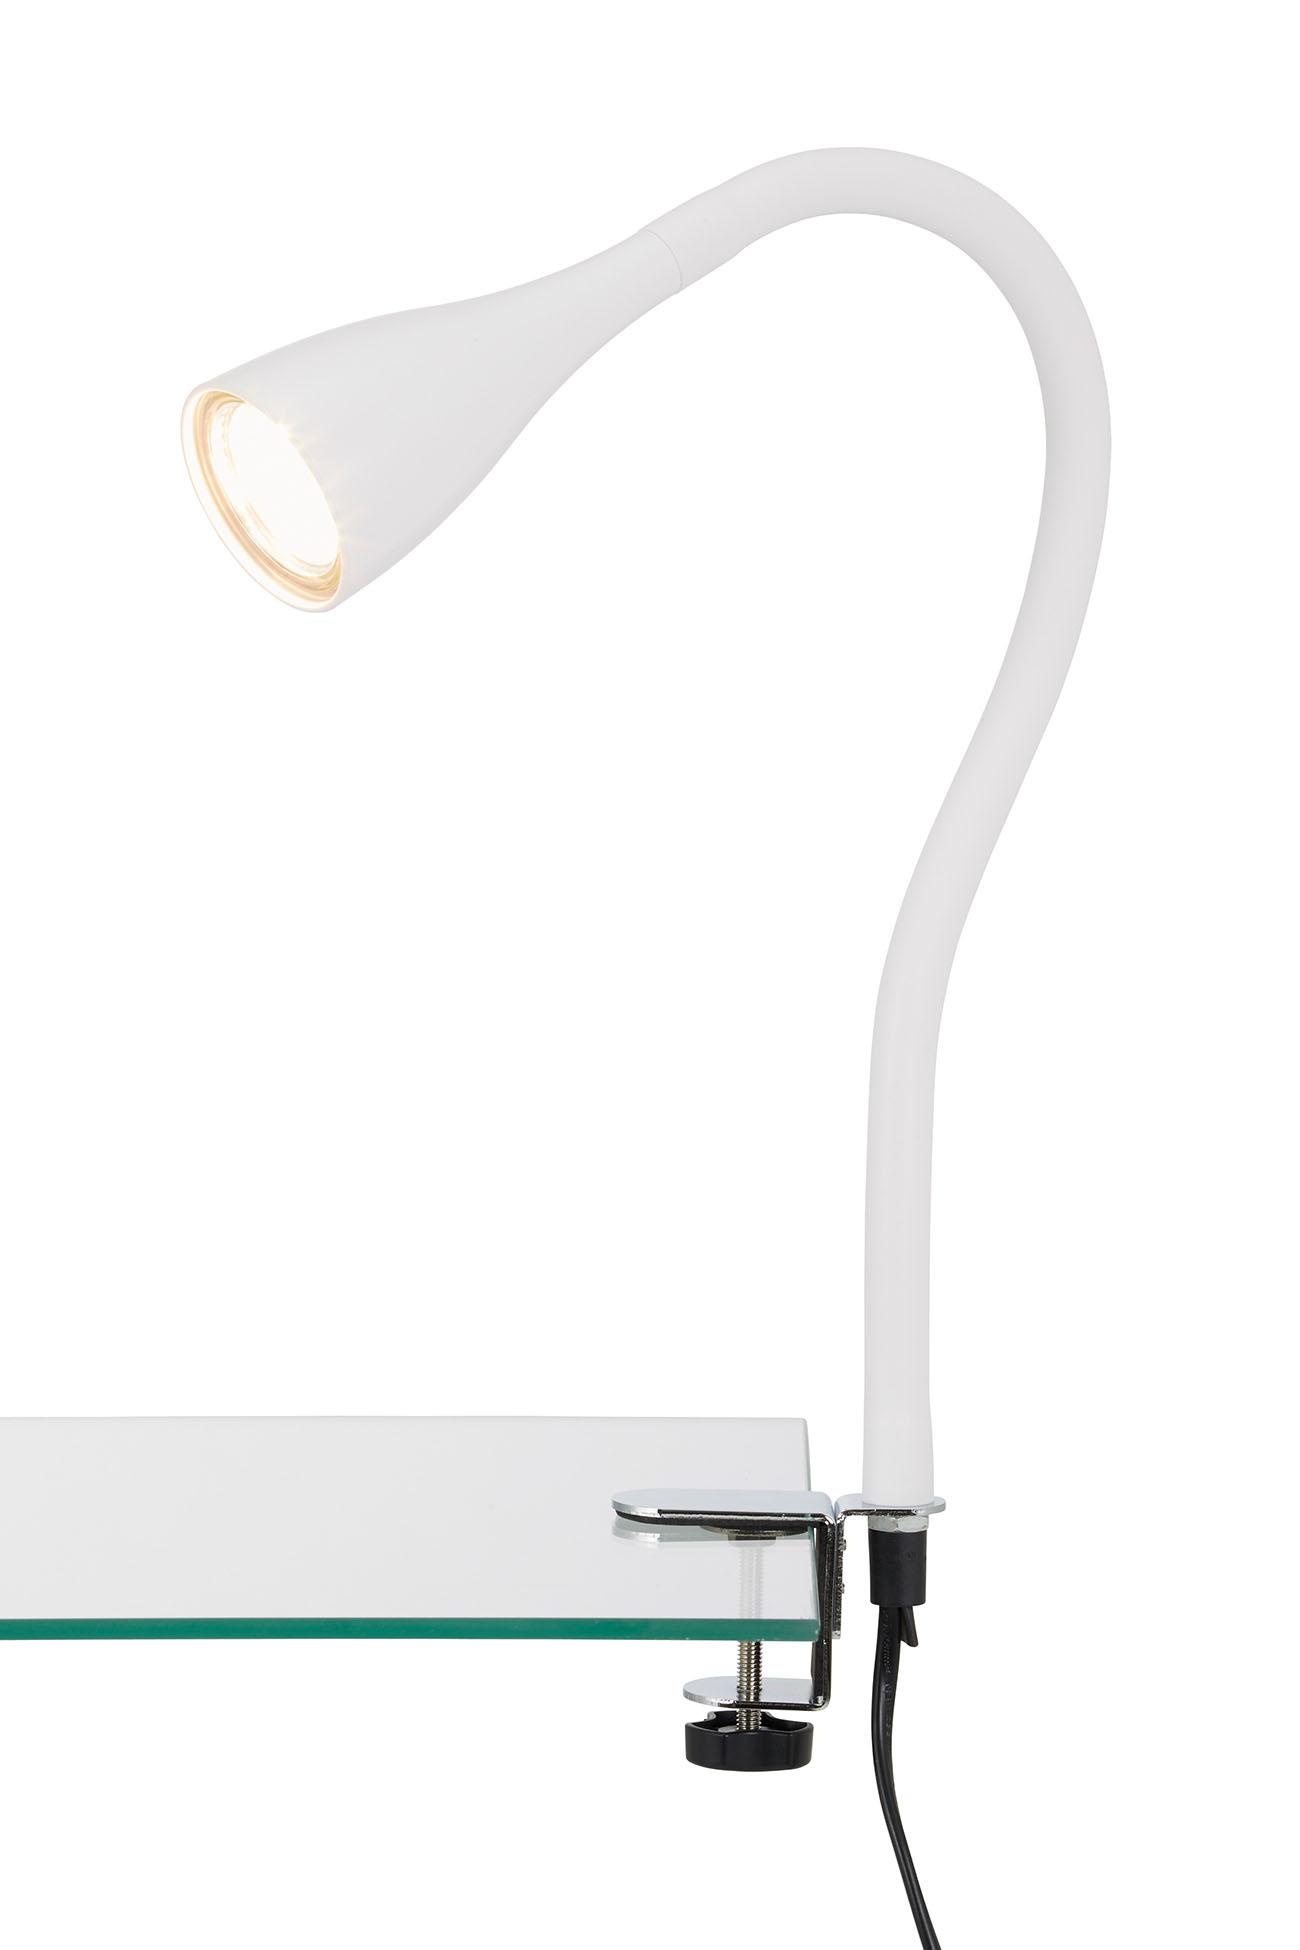 LED Klemmleuchte, 5,5 cm, 3 W, Weiss